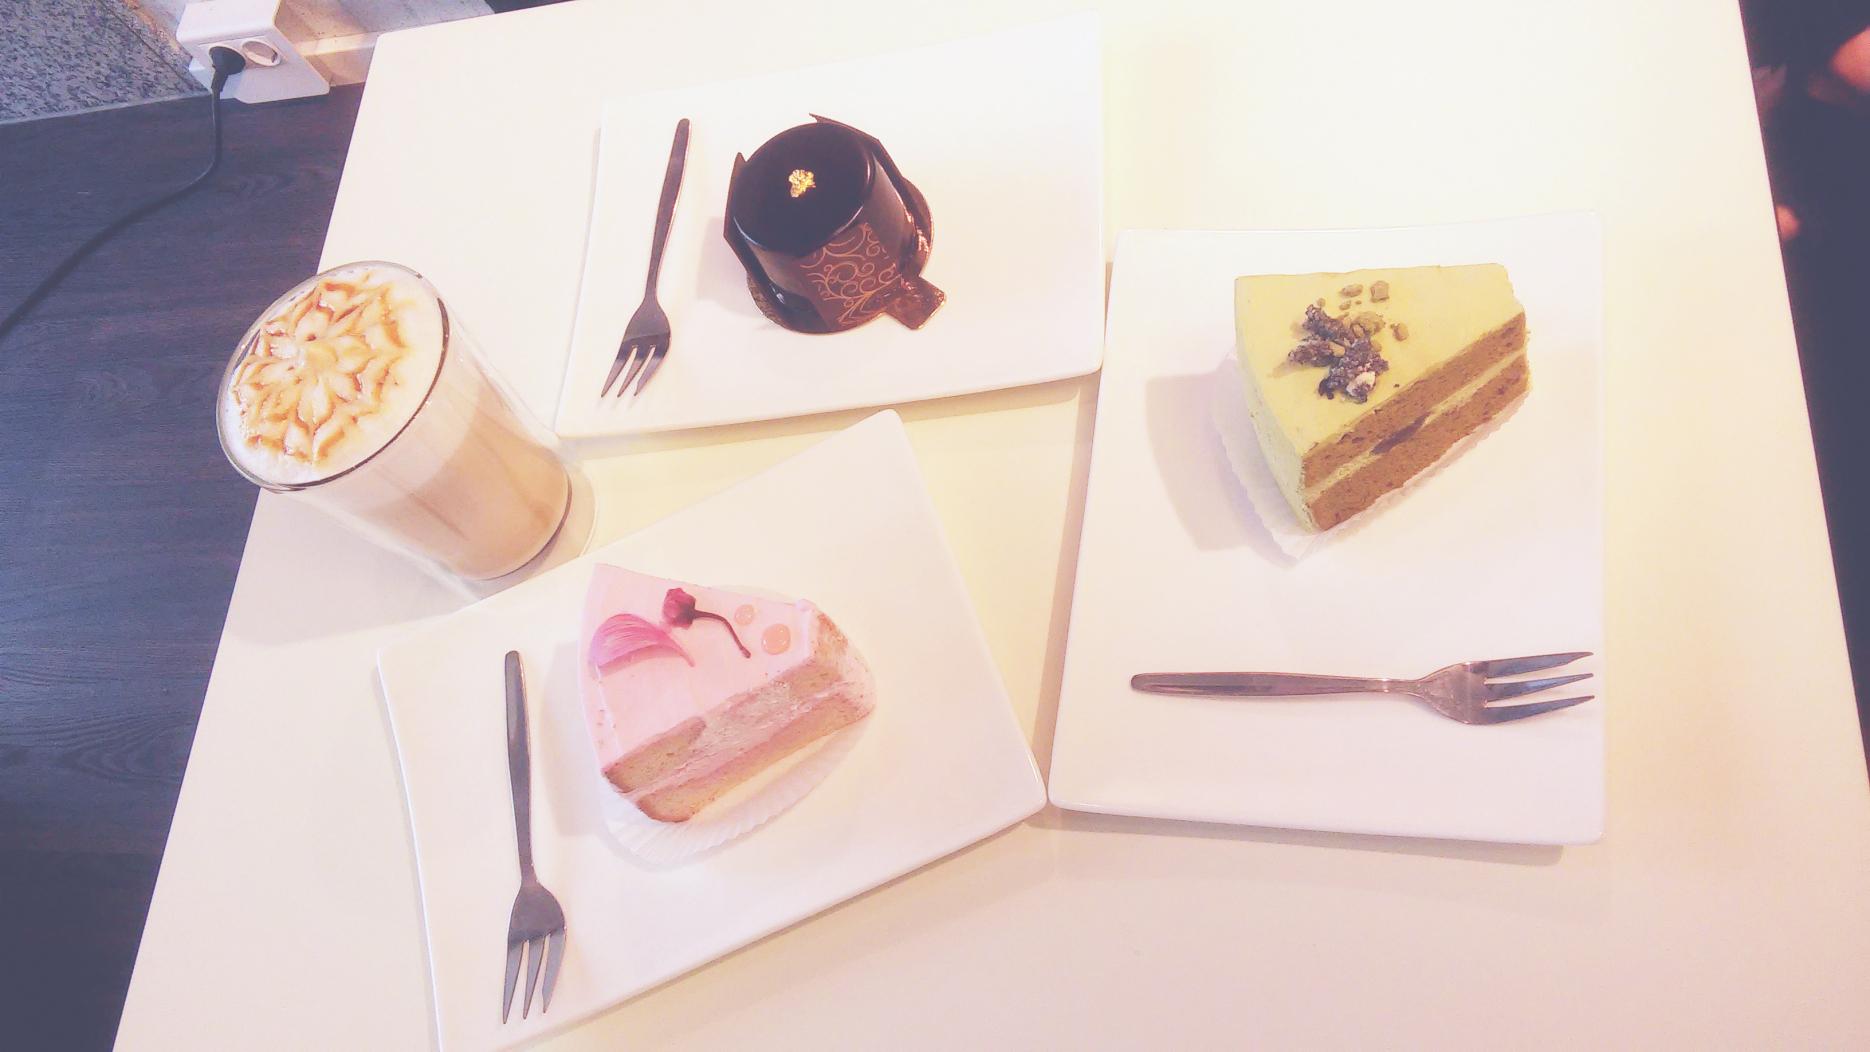 CAFÉ CERISIER: JAPANESE CAKES IN DÜSSELDORF